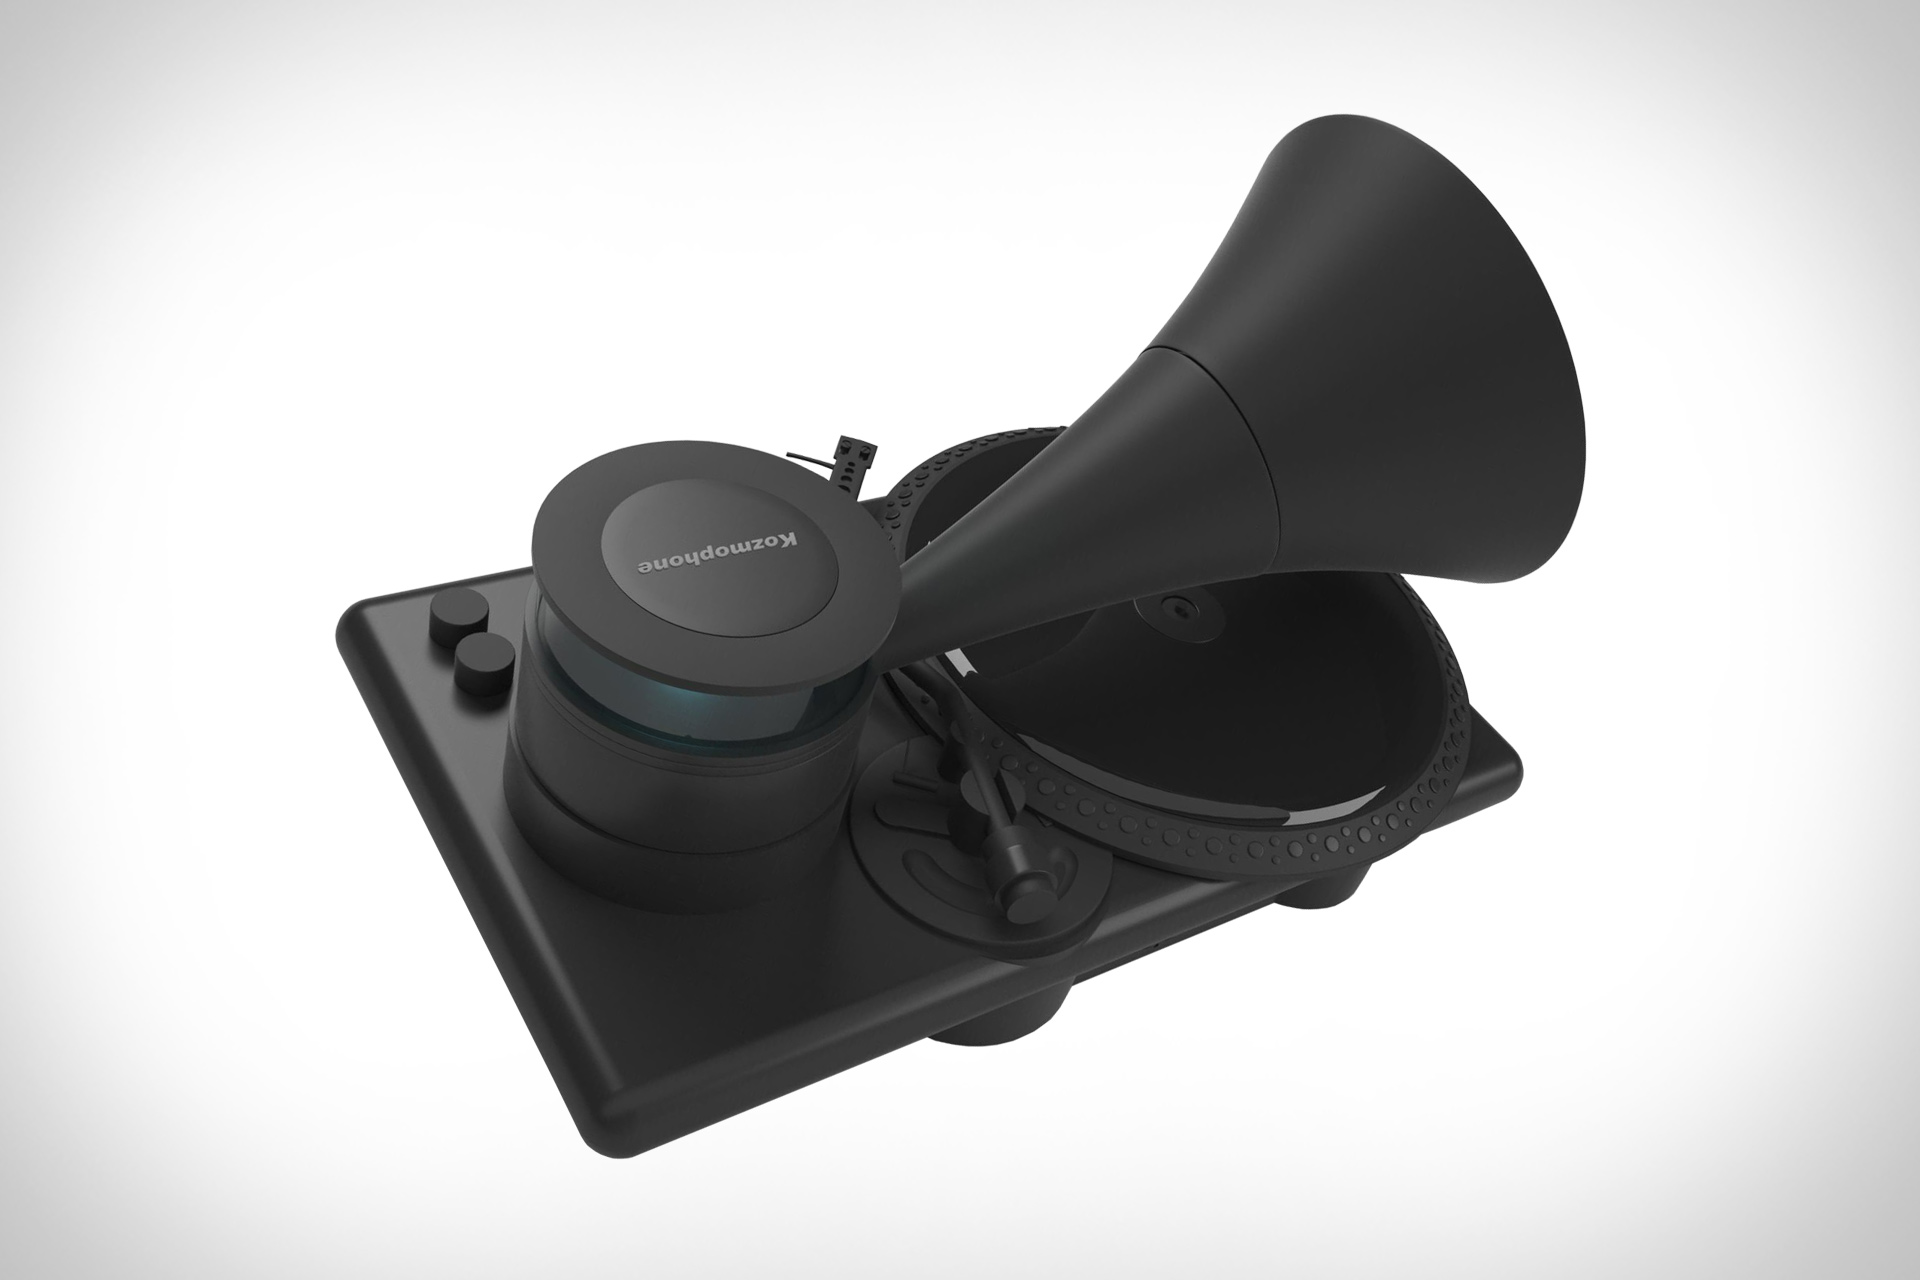 Kozmophone